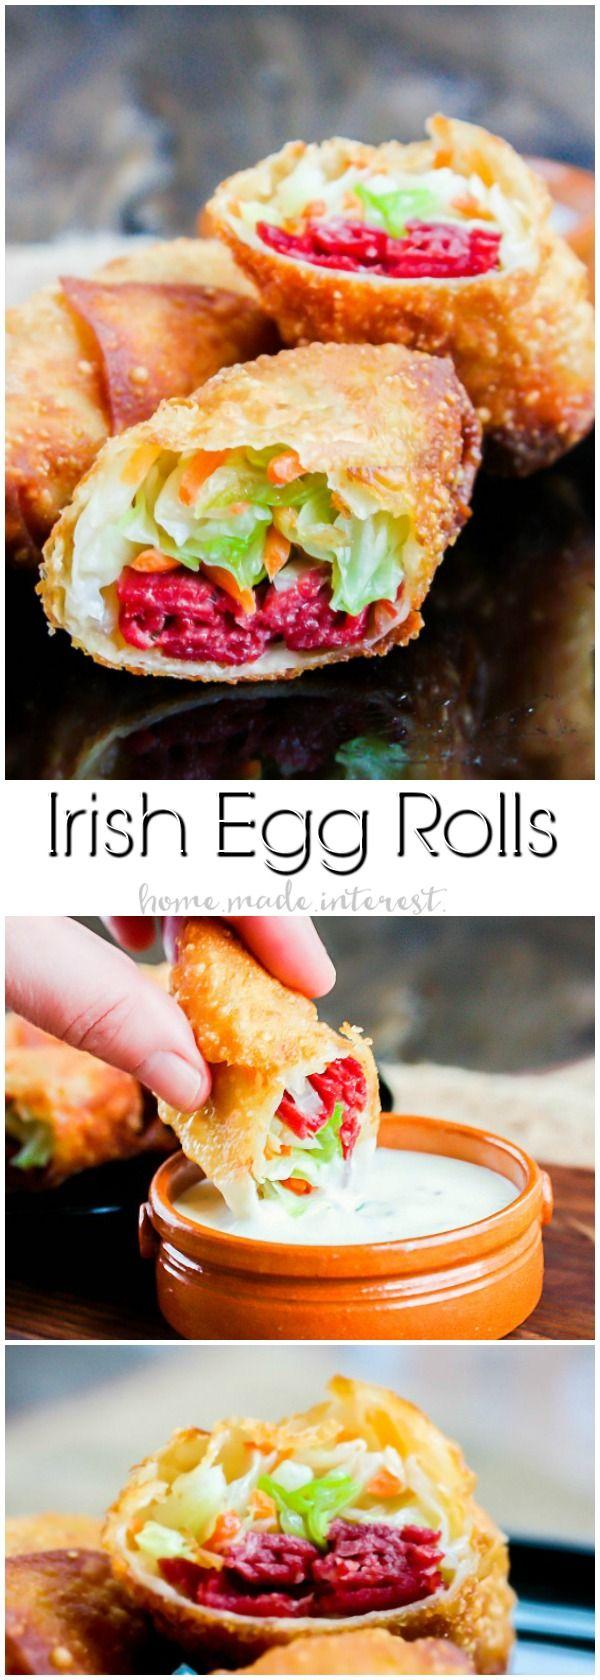 Irish Egg Rolls Corned Beef And CabbageRecipes